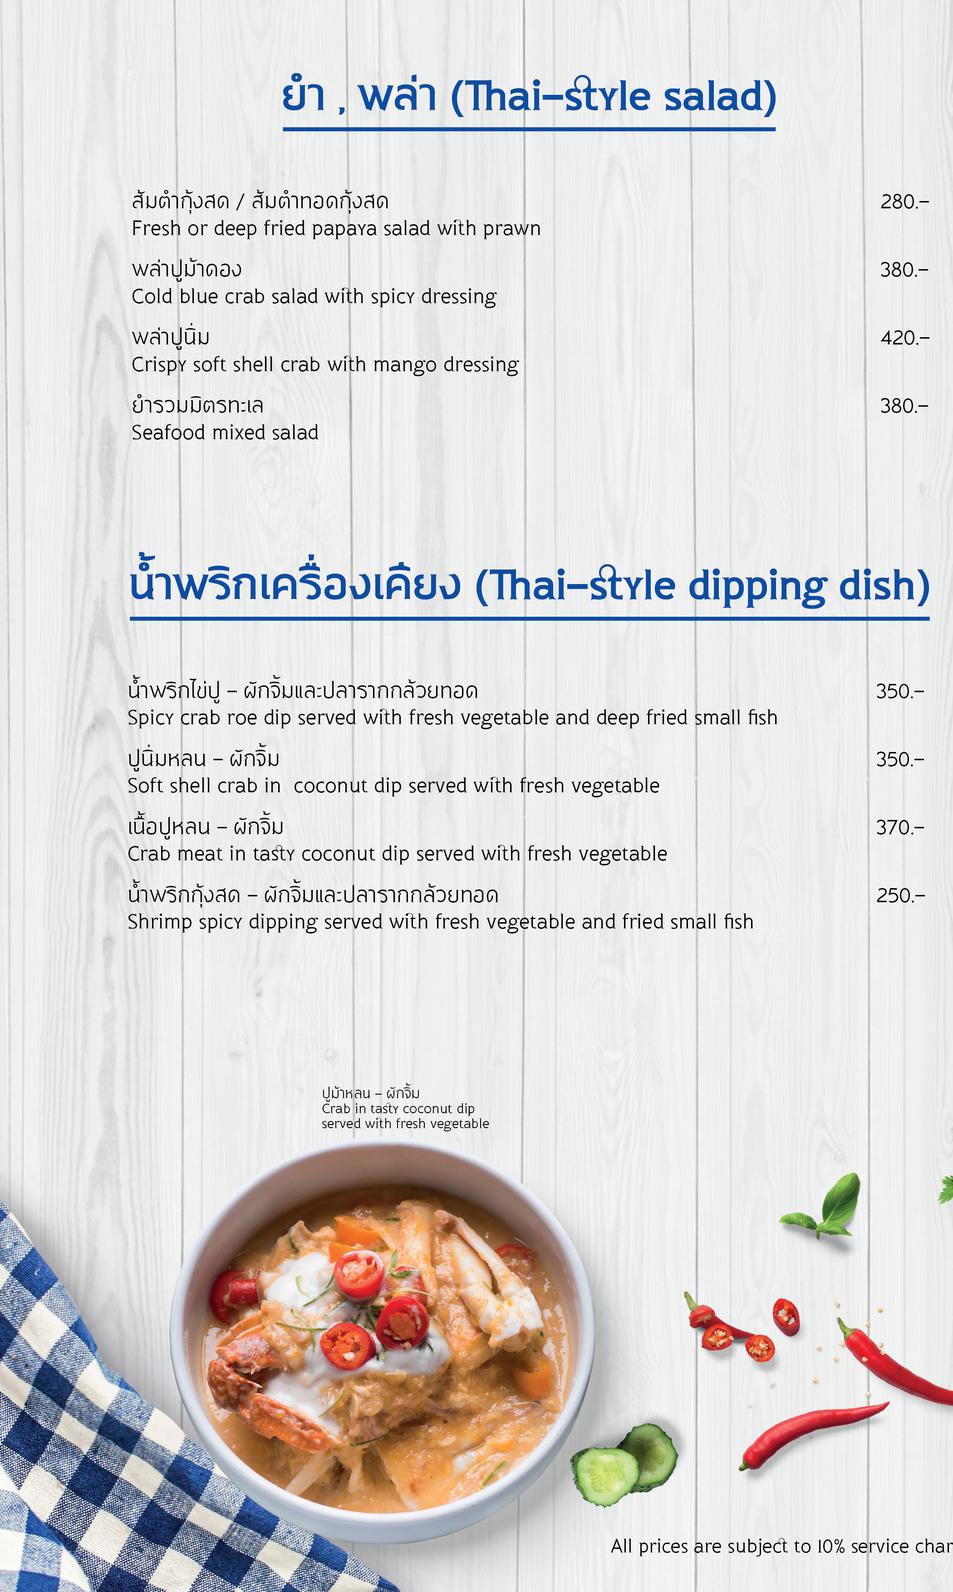 Thai-style salad & Thai-style dipping dish